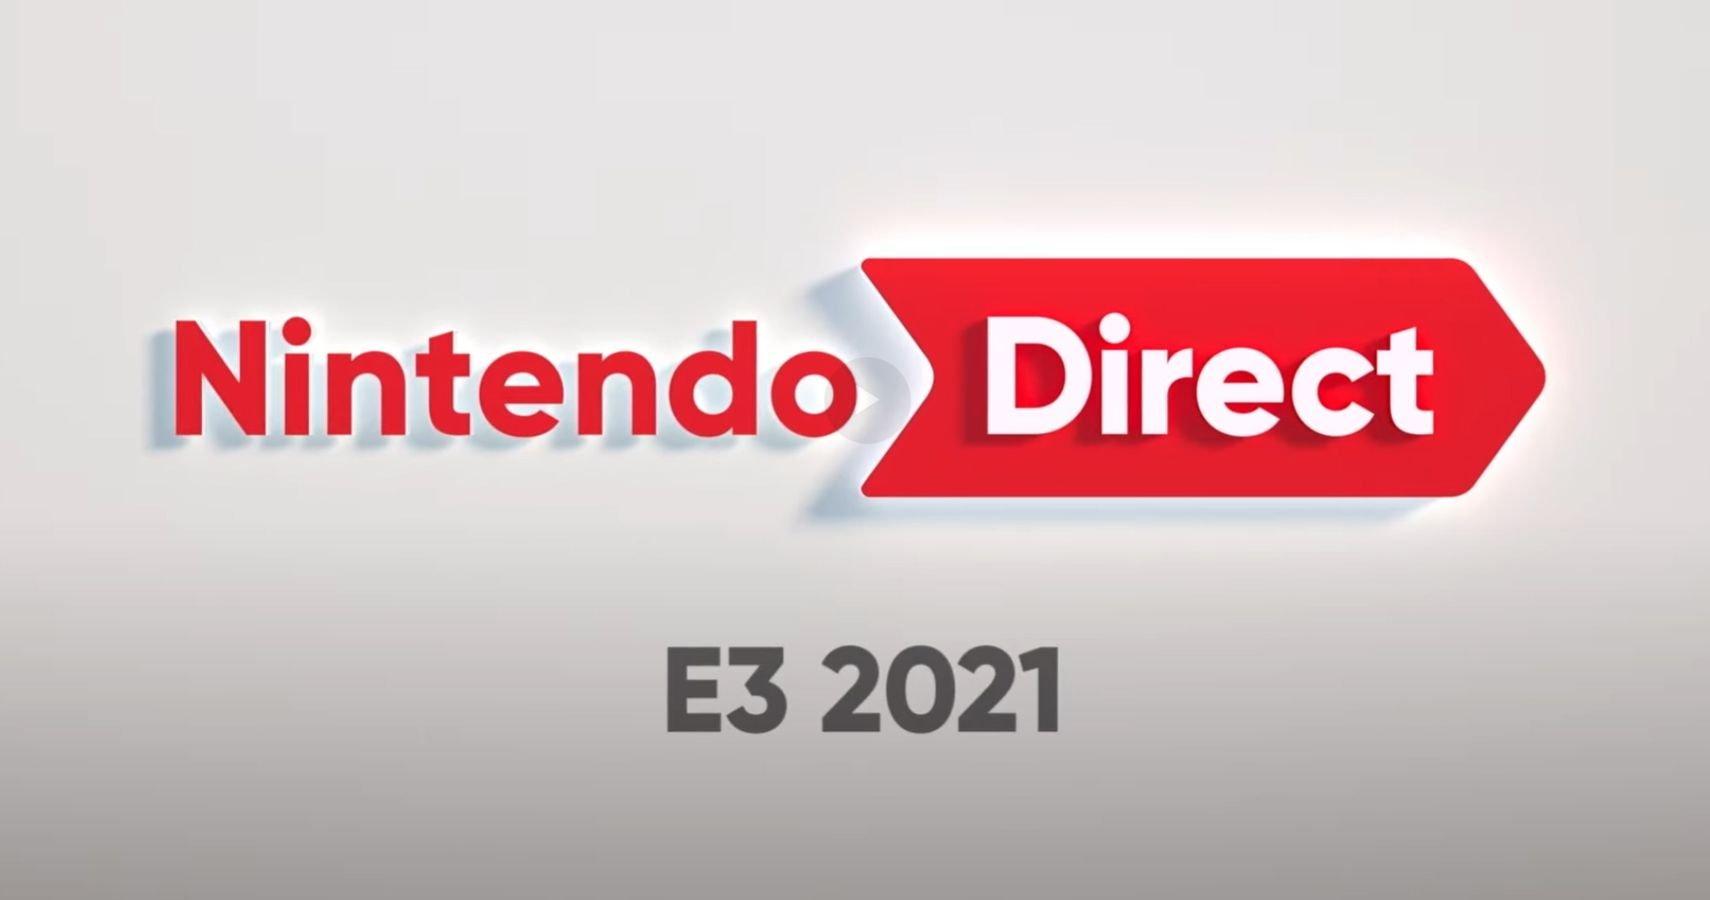 Nintendo Direct E3 2021: Metroid Dread, Breath Of The Wild 2, Mario Party, And More